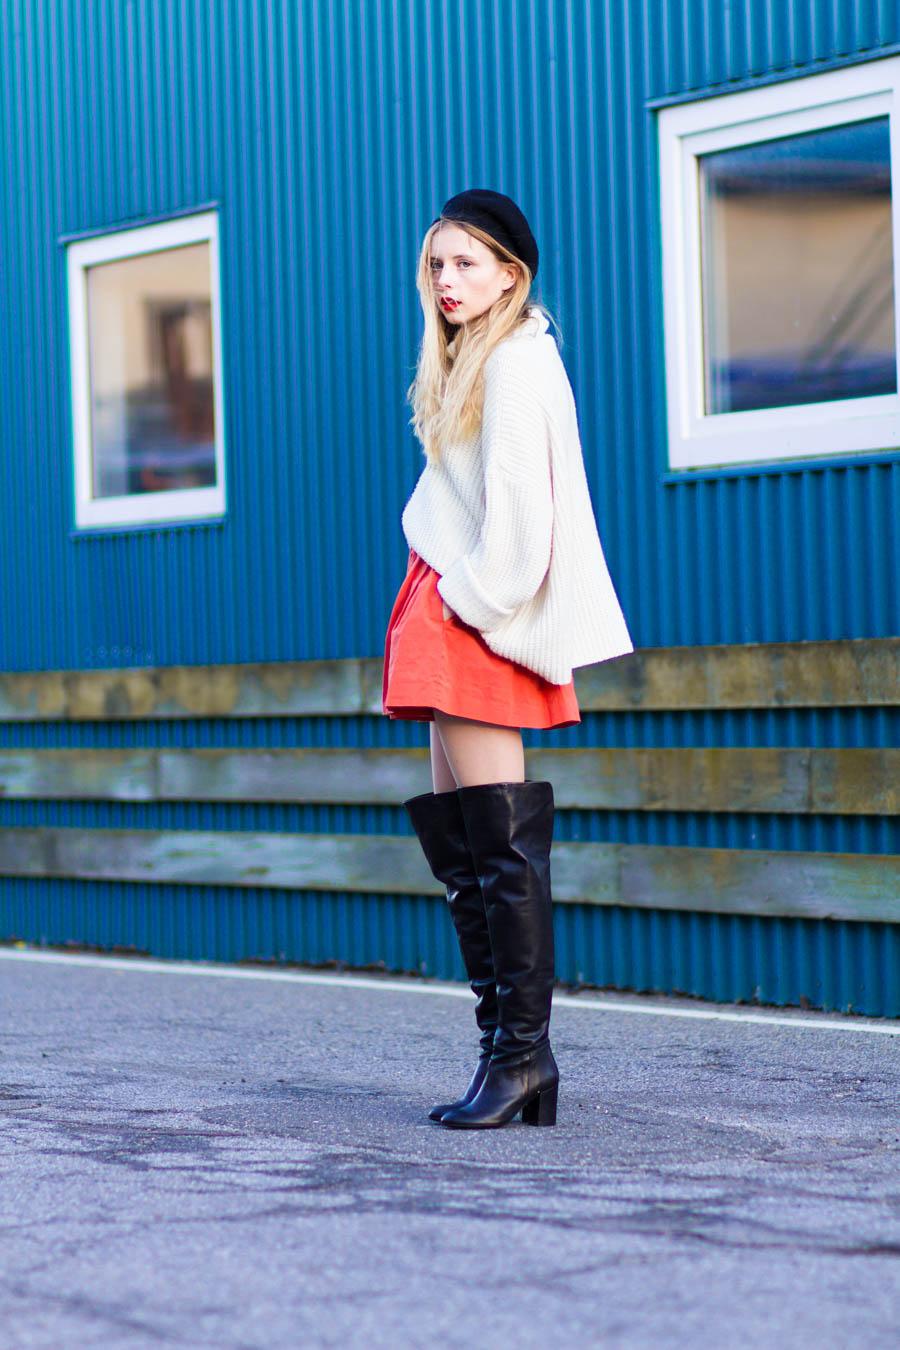 outfit december nemesis babe marie jensen danish blogger thigh high boots sarenza zara orange skirt vintage sweater and beret-2